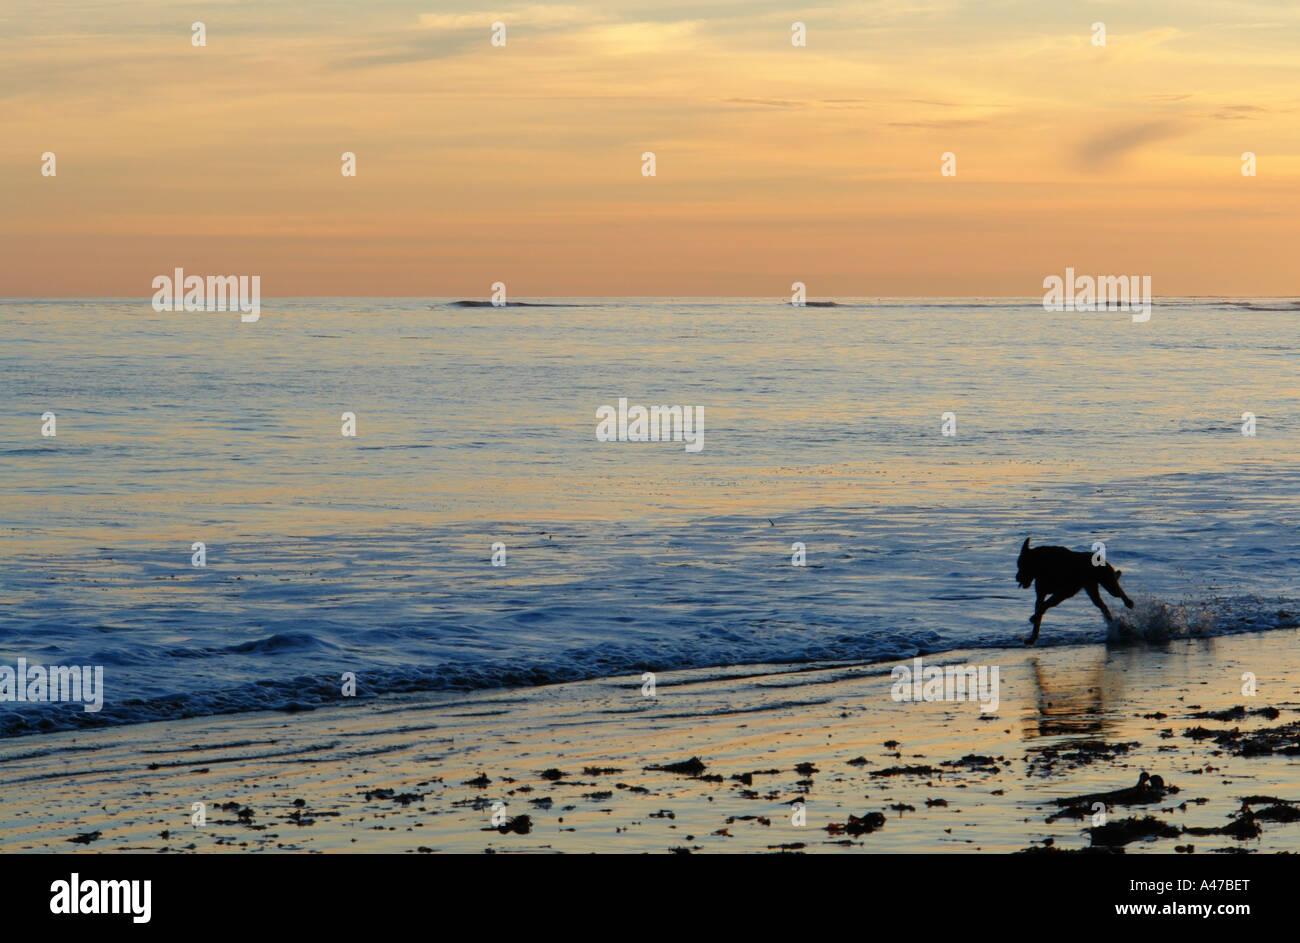 Dog at China Beach Aptos California United States - Stock Image